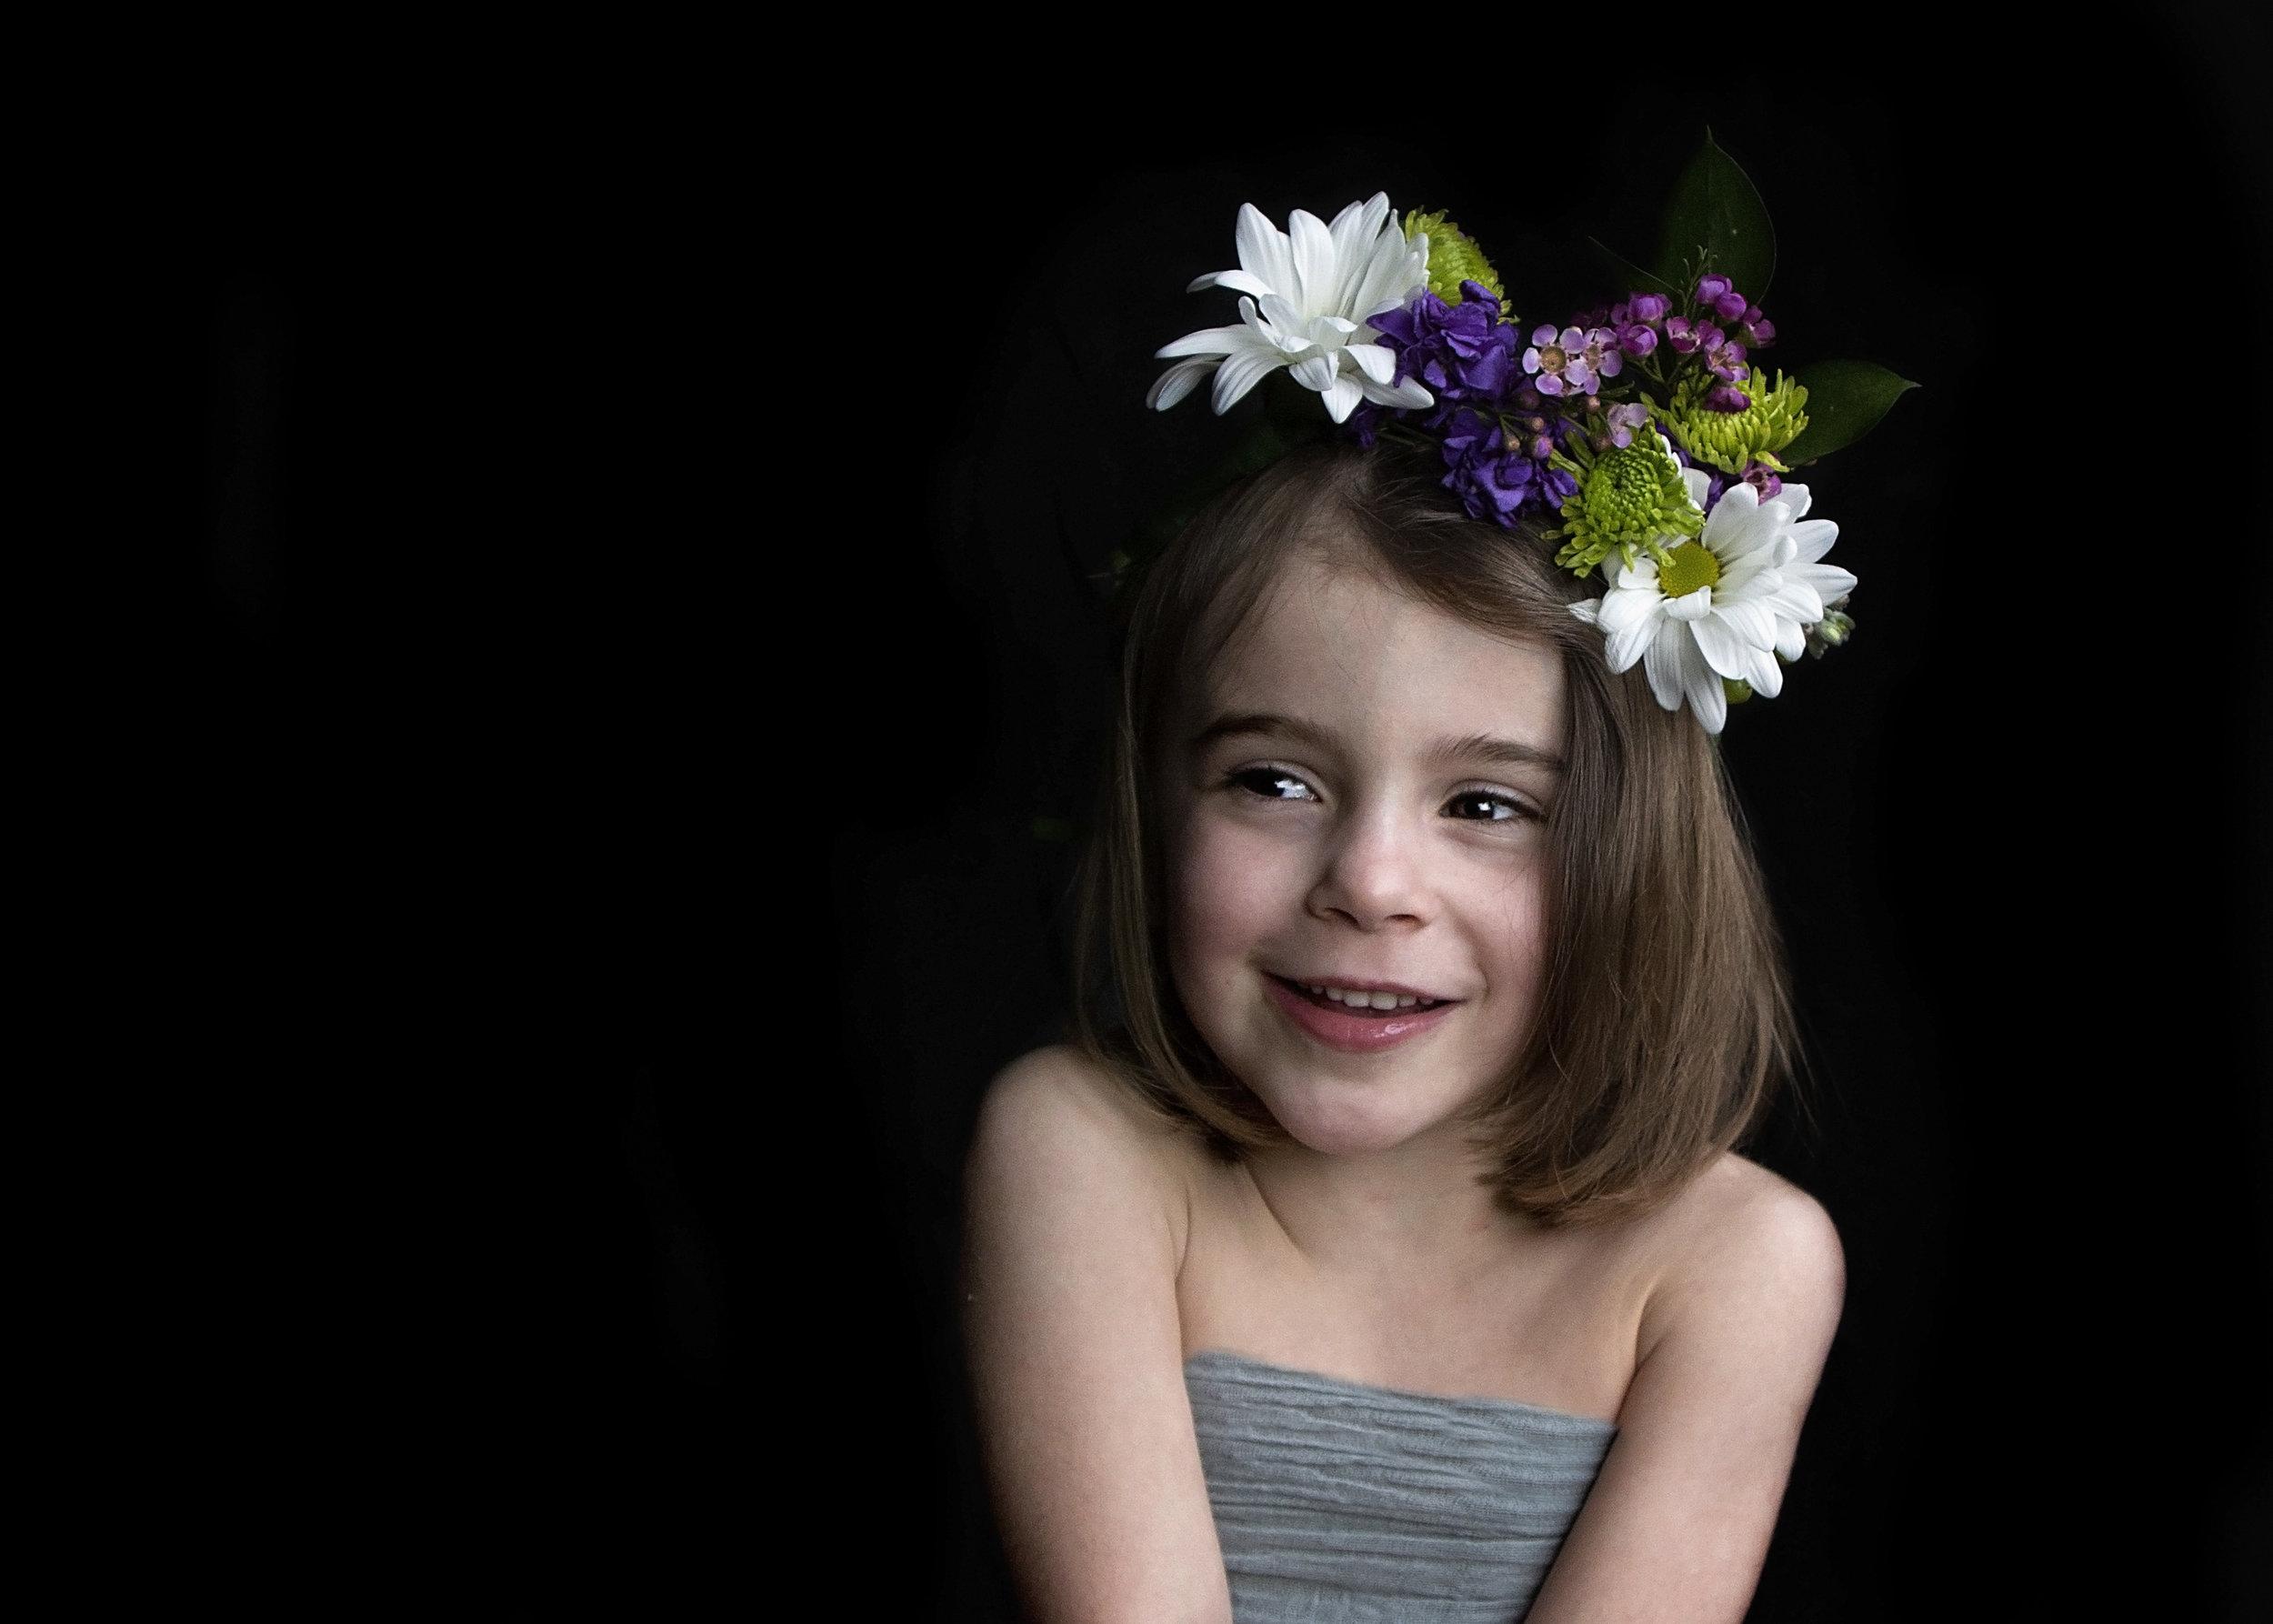 Flower1-34ff.jpg